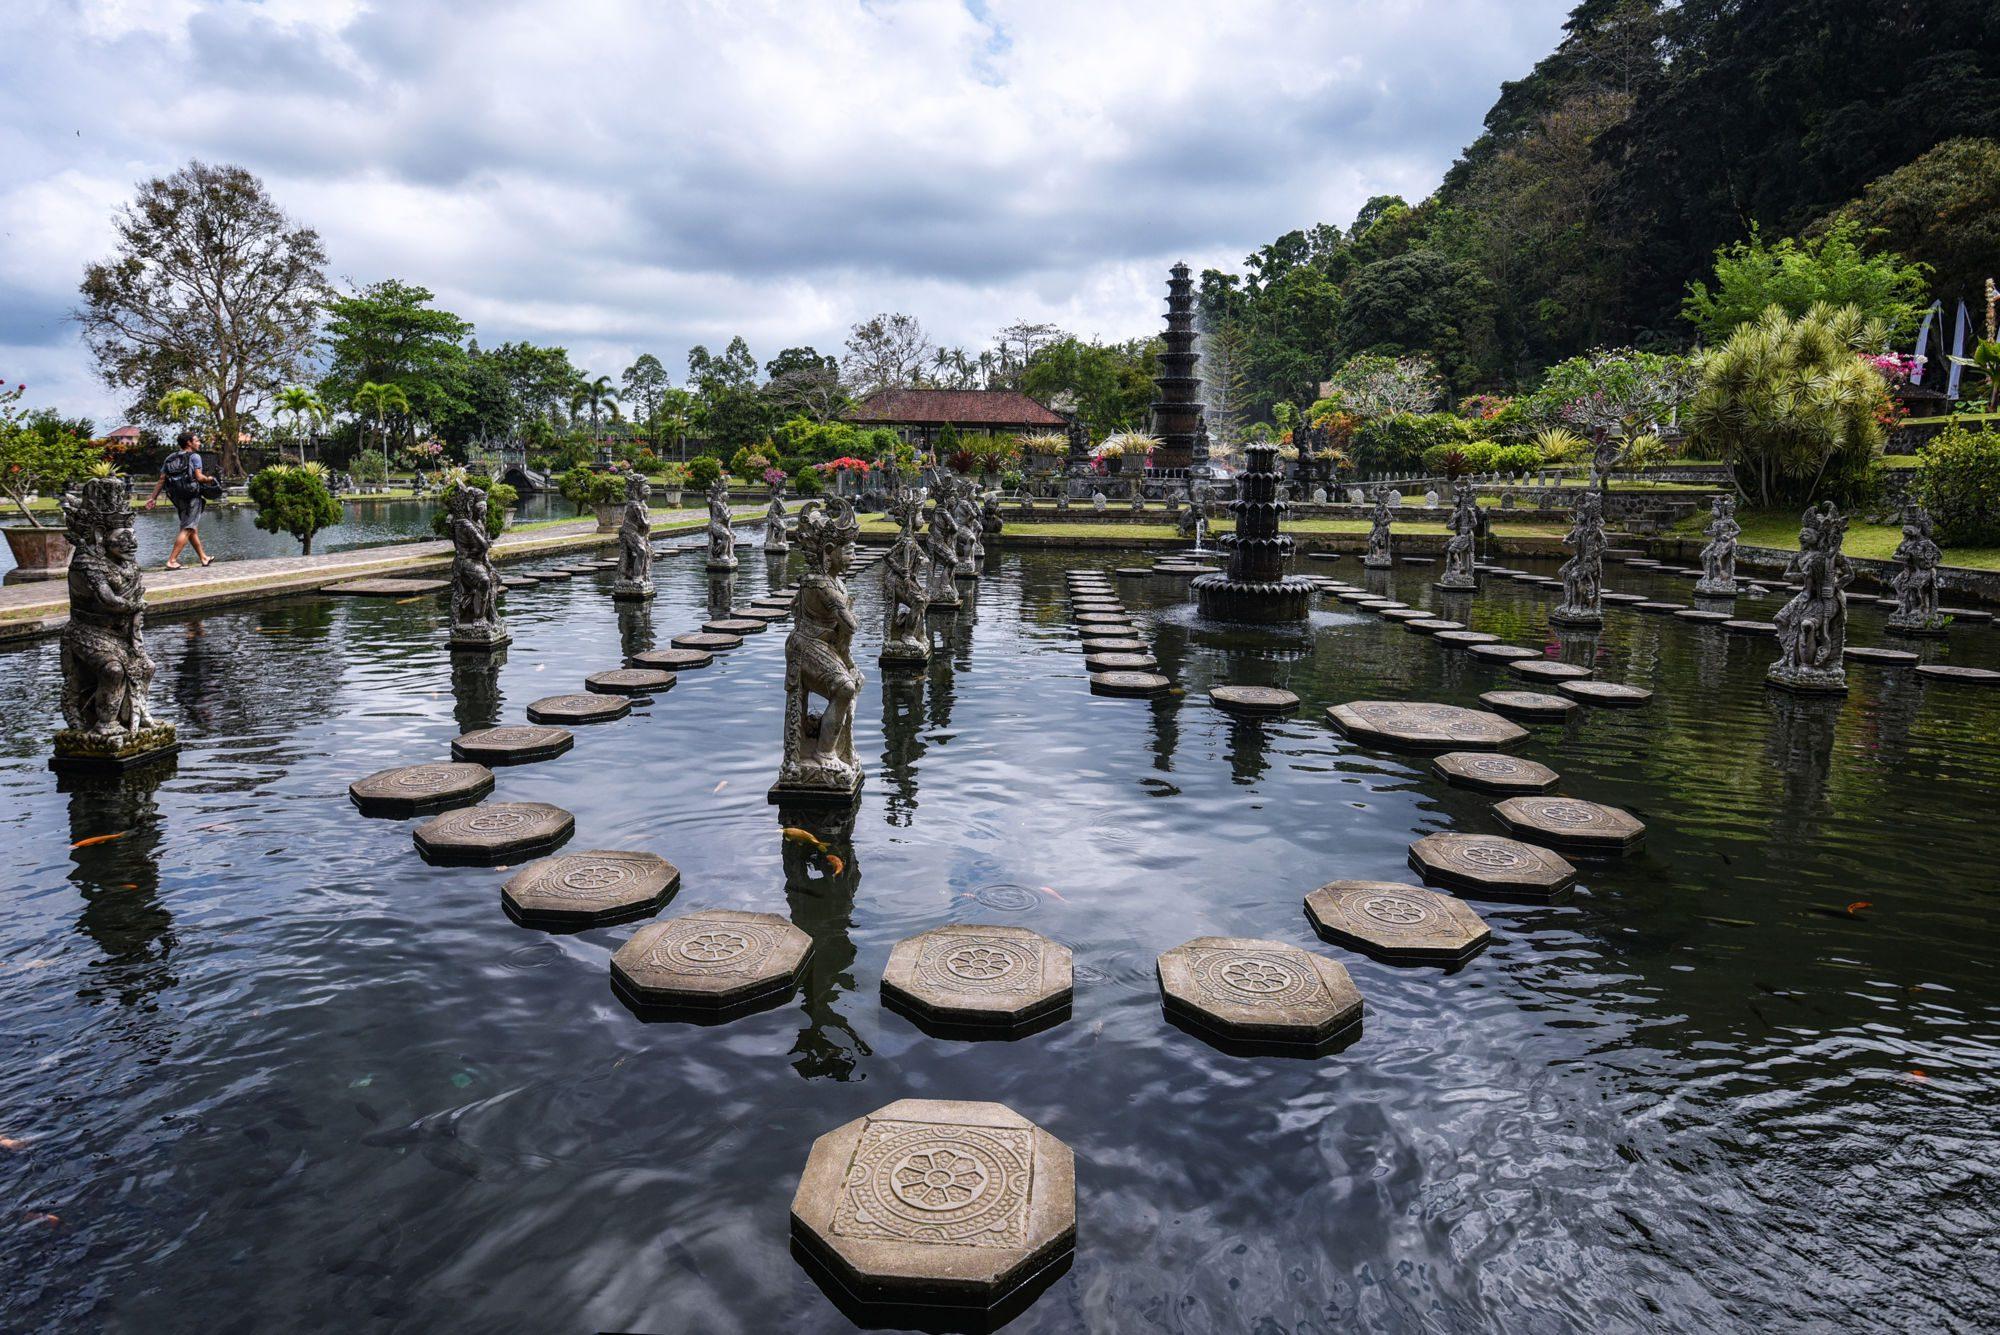 На фото водный дворец